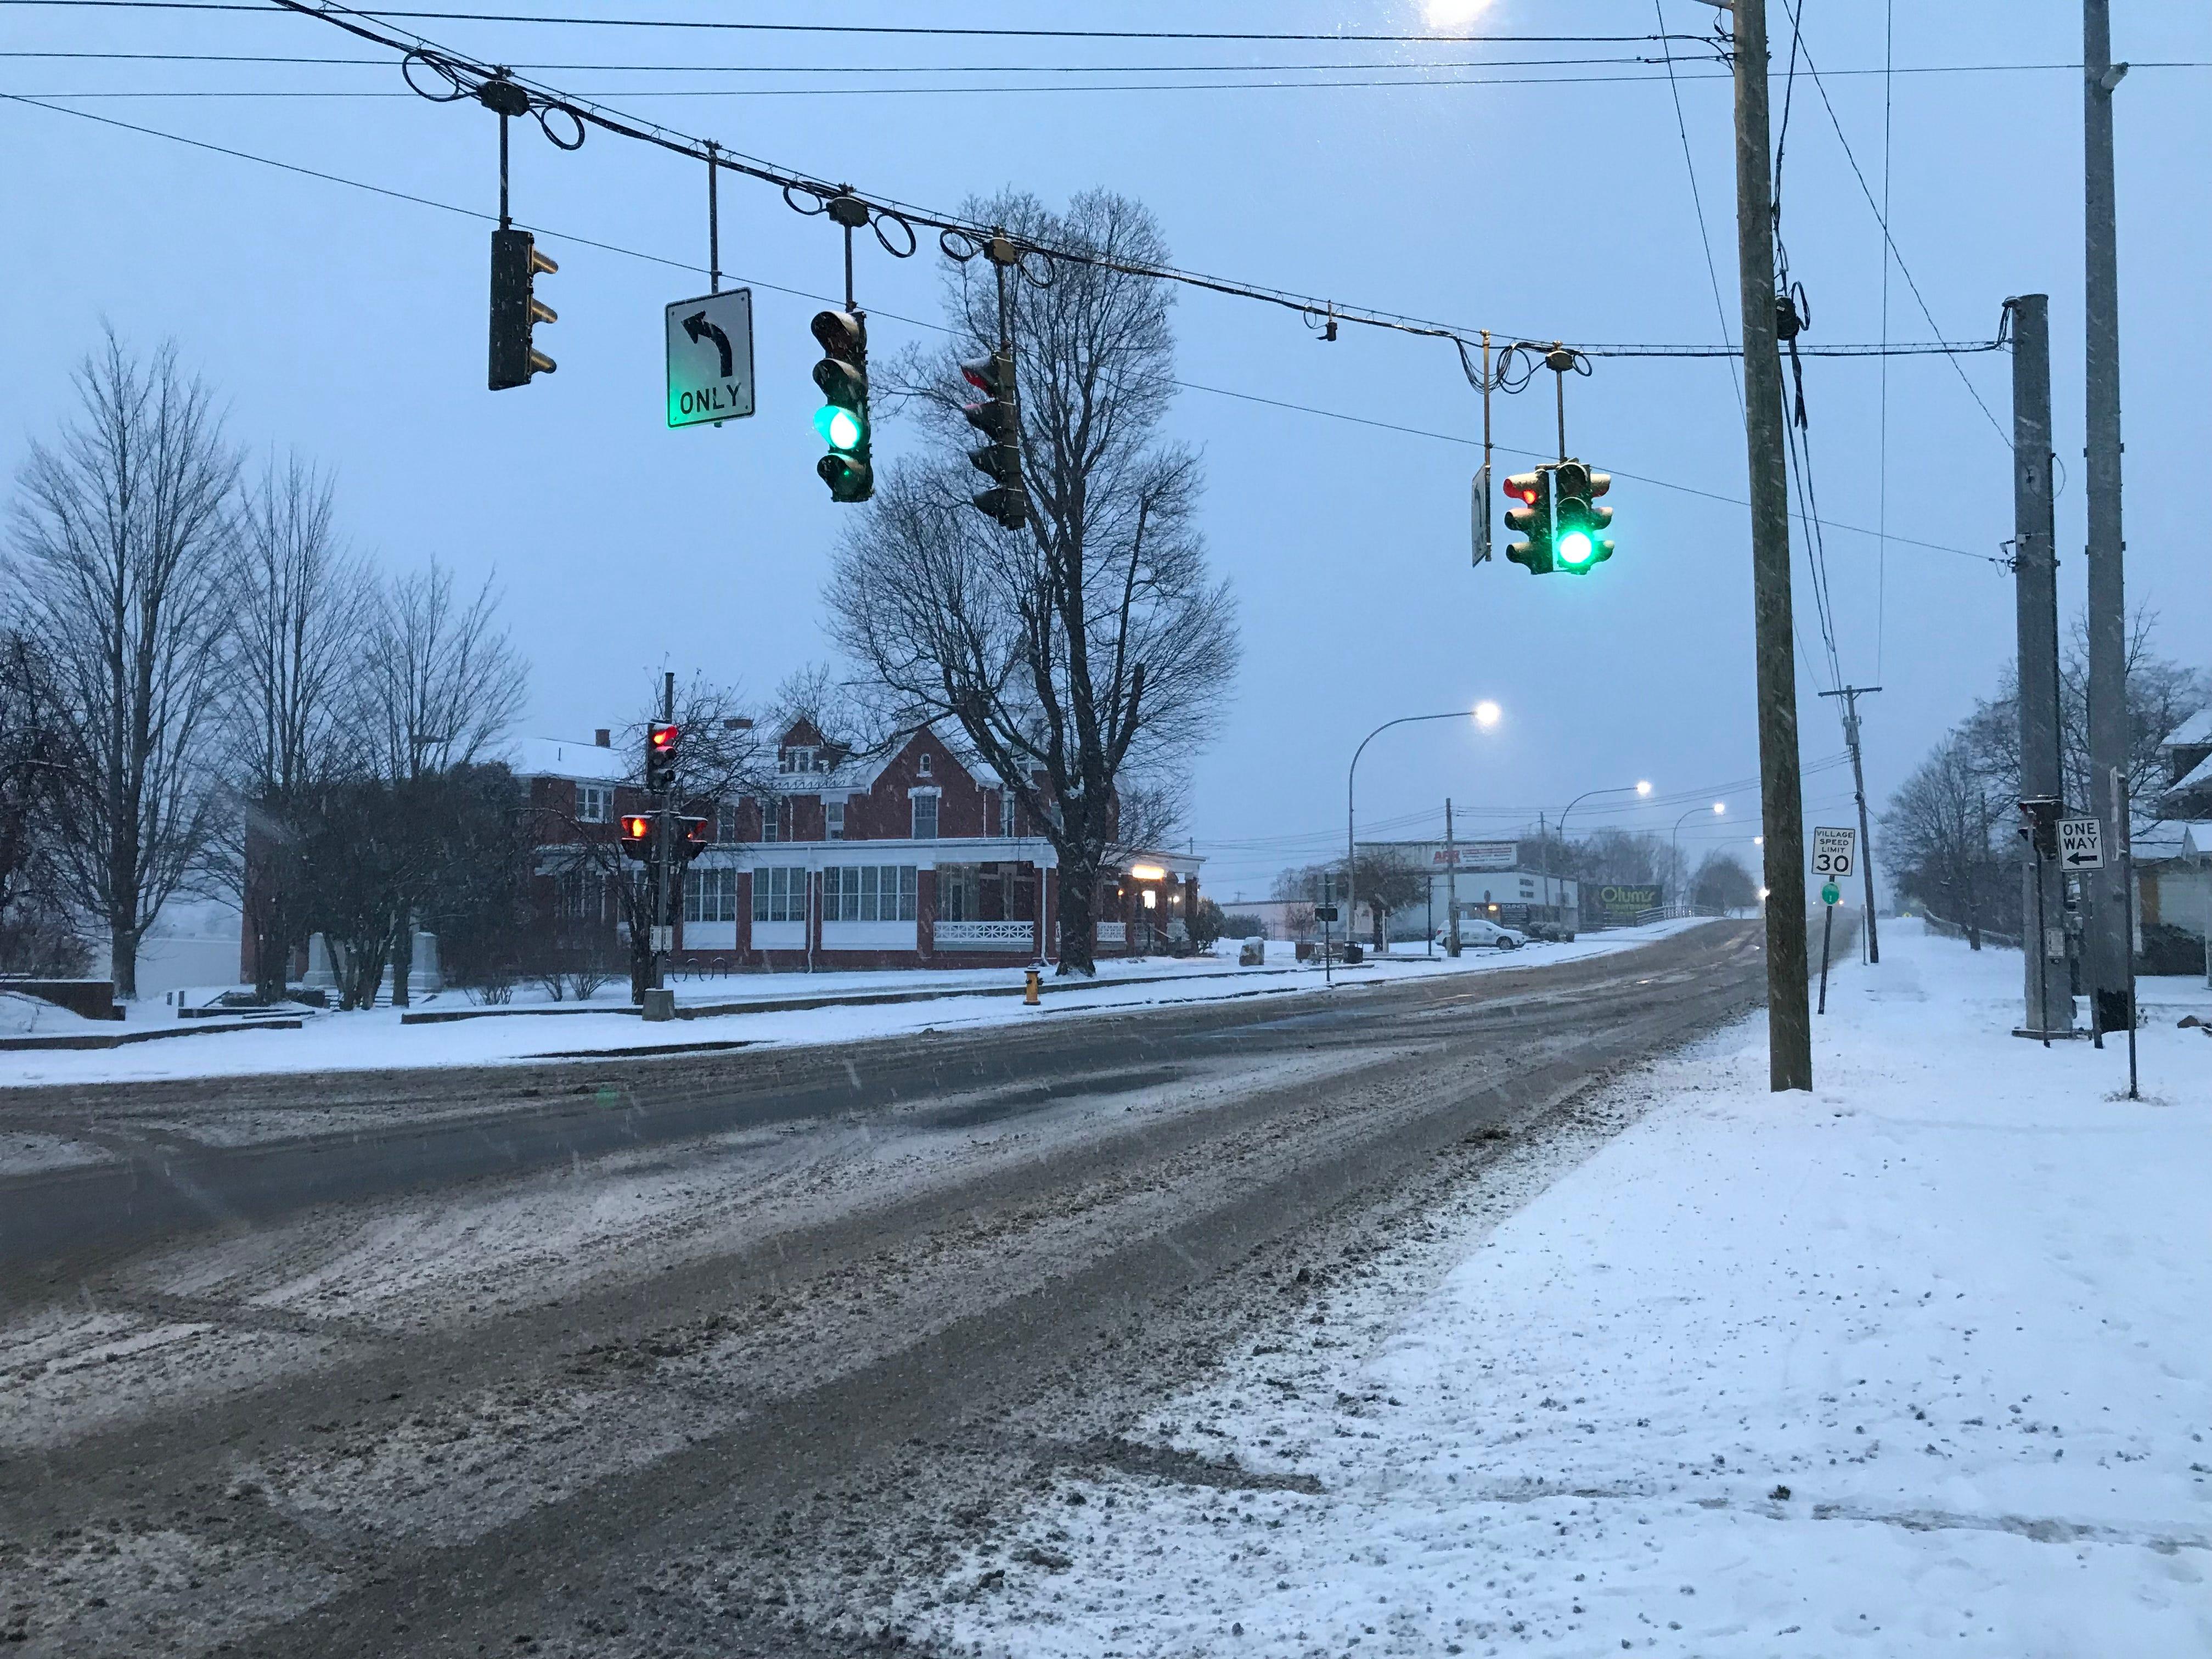 Snowy roads met travelers on Main Street in Johnson City Saturday.